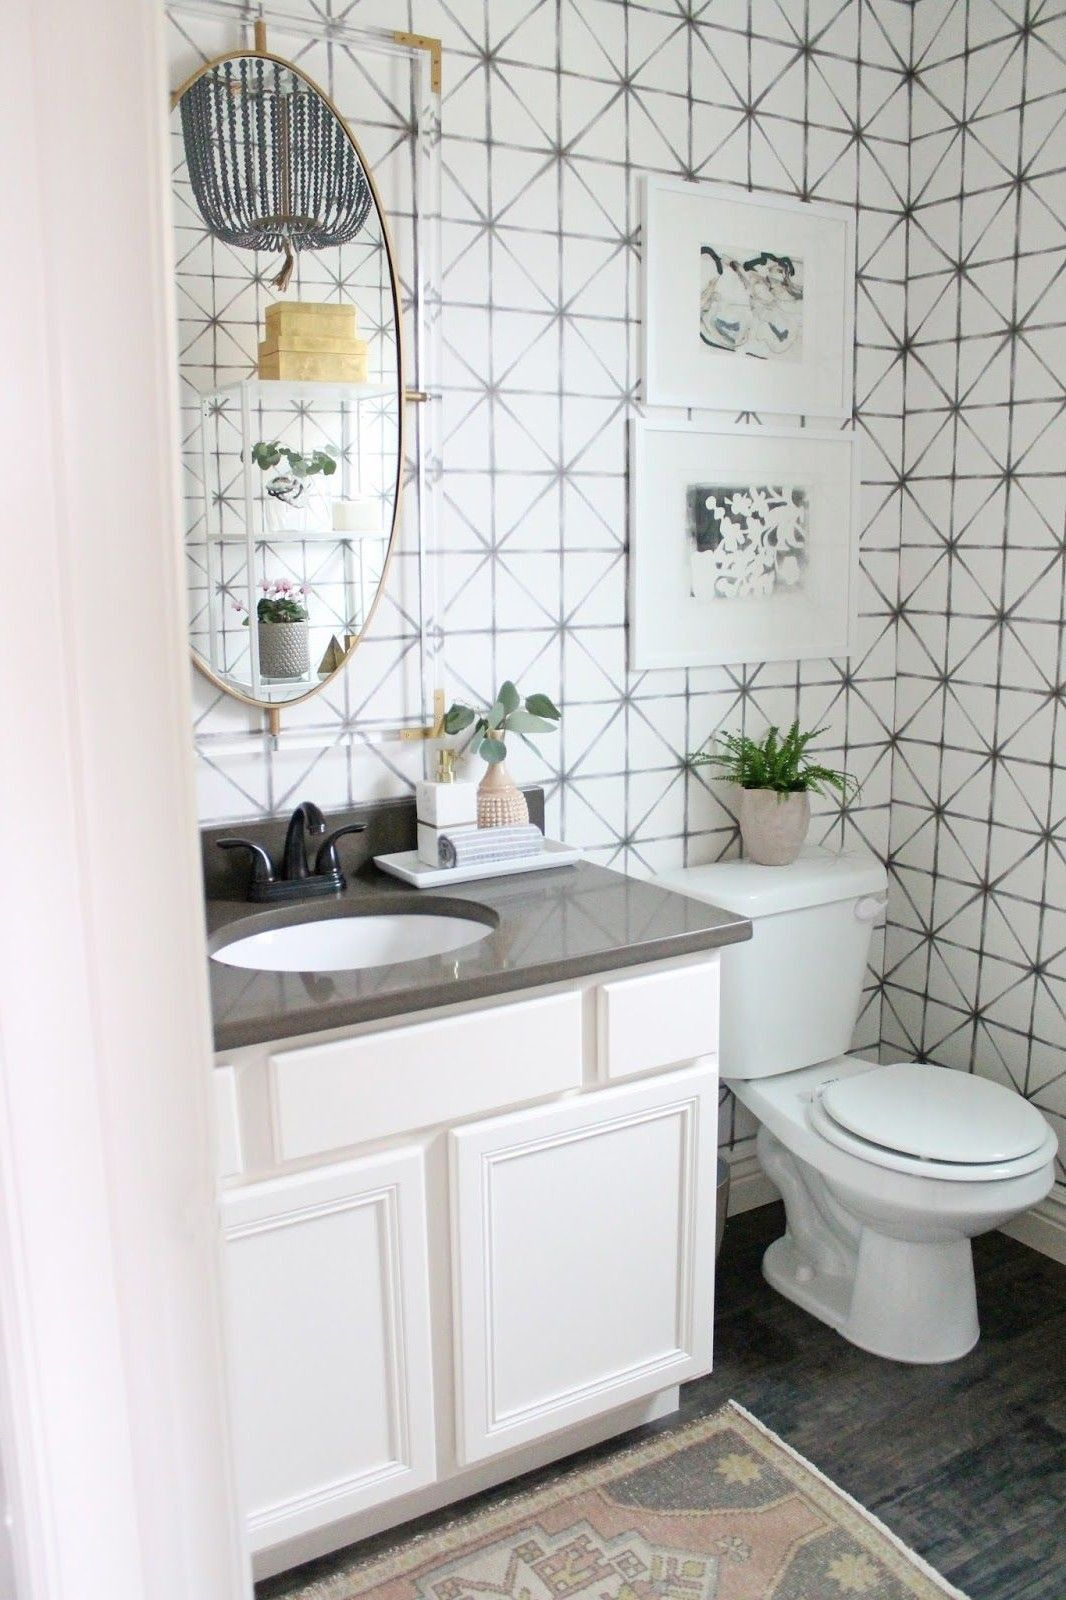 Bathroom Wallpaper Decorating Ideas 2021 Bathroom Wallpaper Rustic Powder Room Bathroom Wallpaper Modern